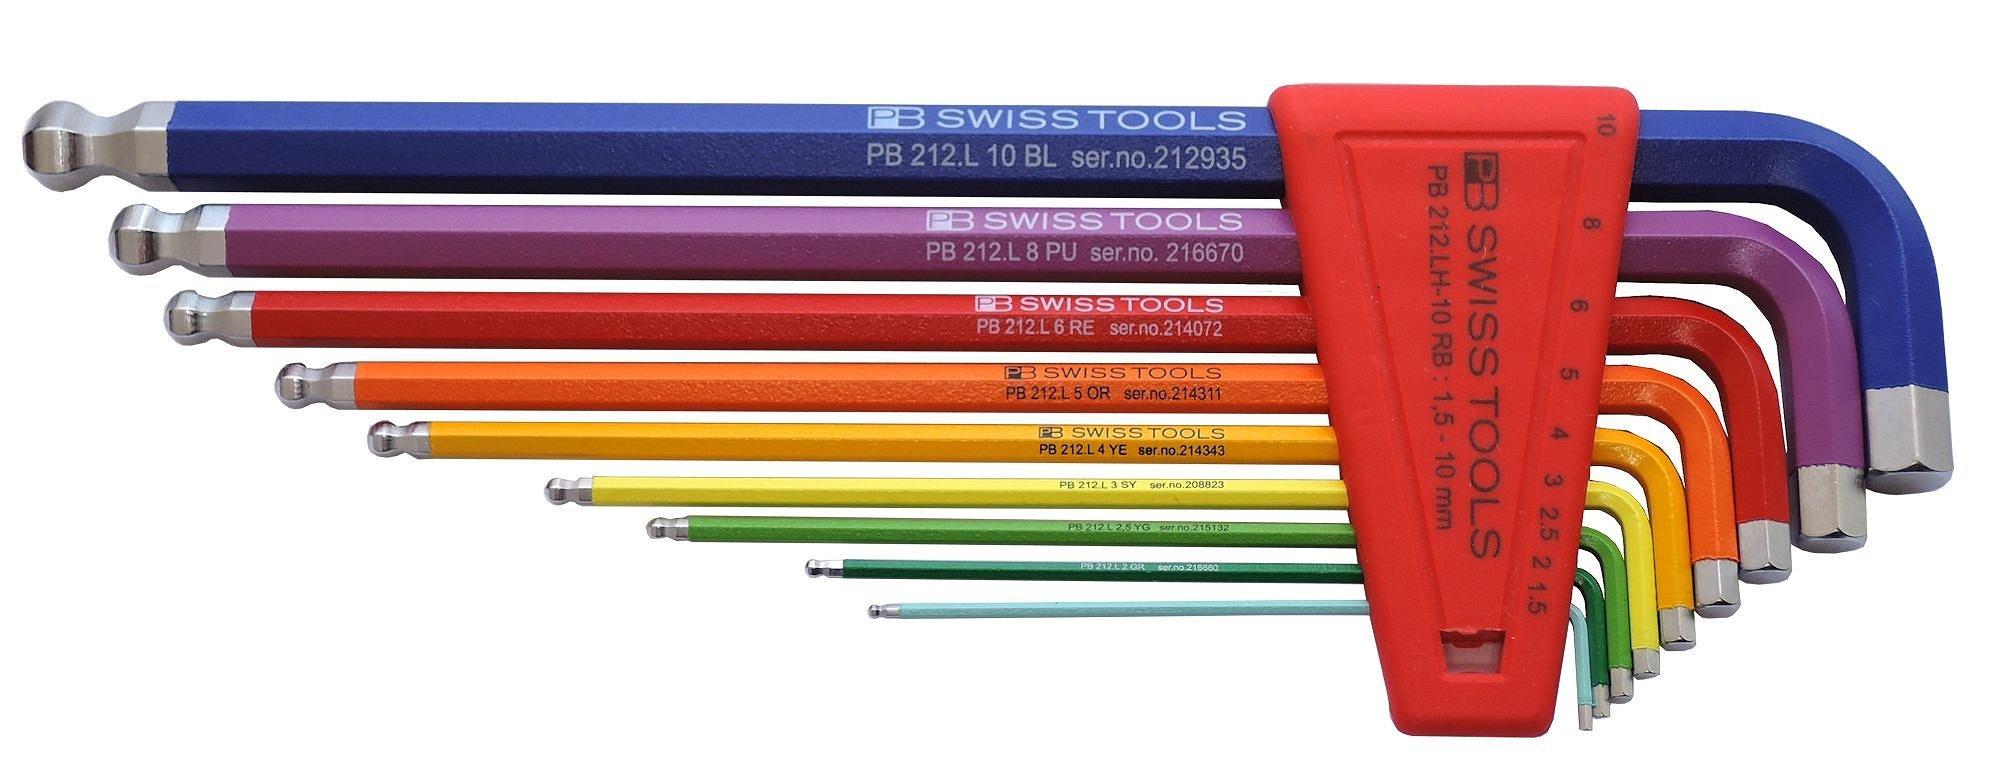 PB Swiss Tools PB 212LH-10 RB Ballend hex set long rainbow by PB Swiss